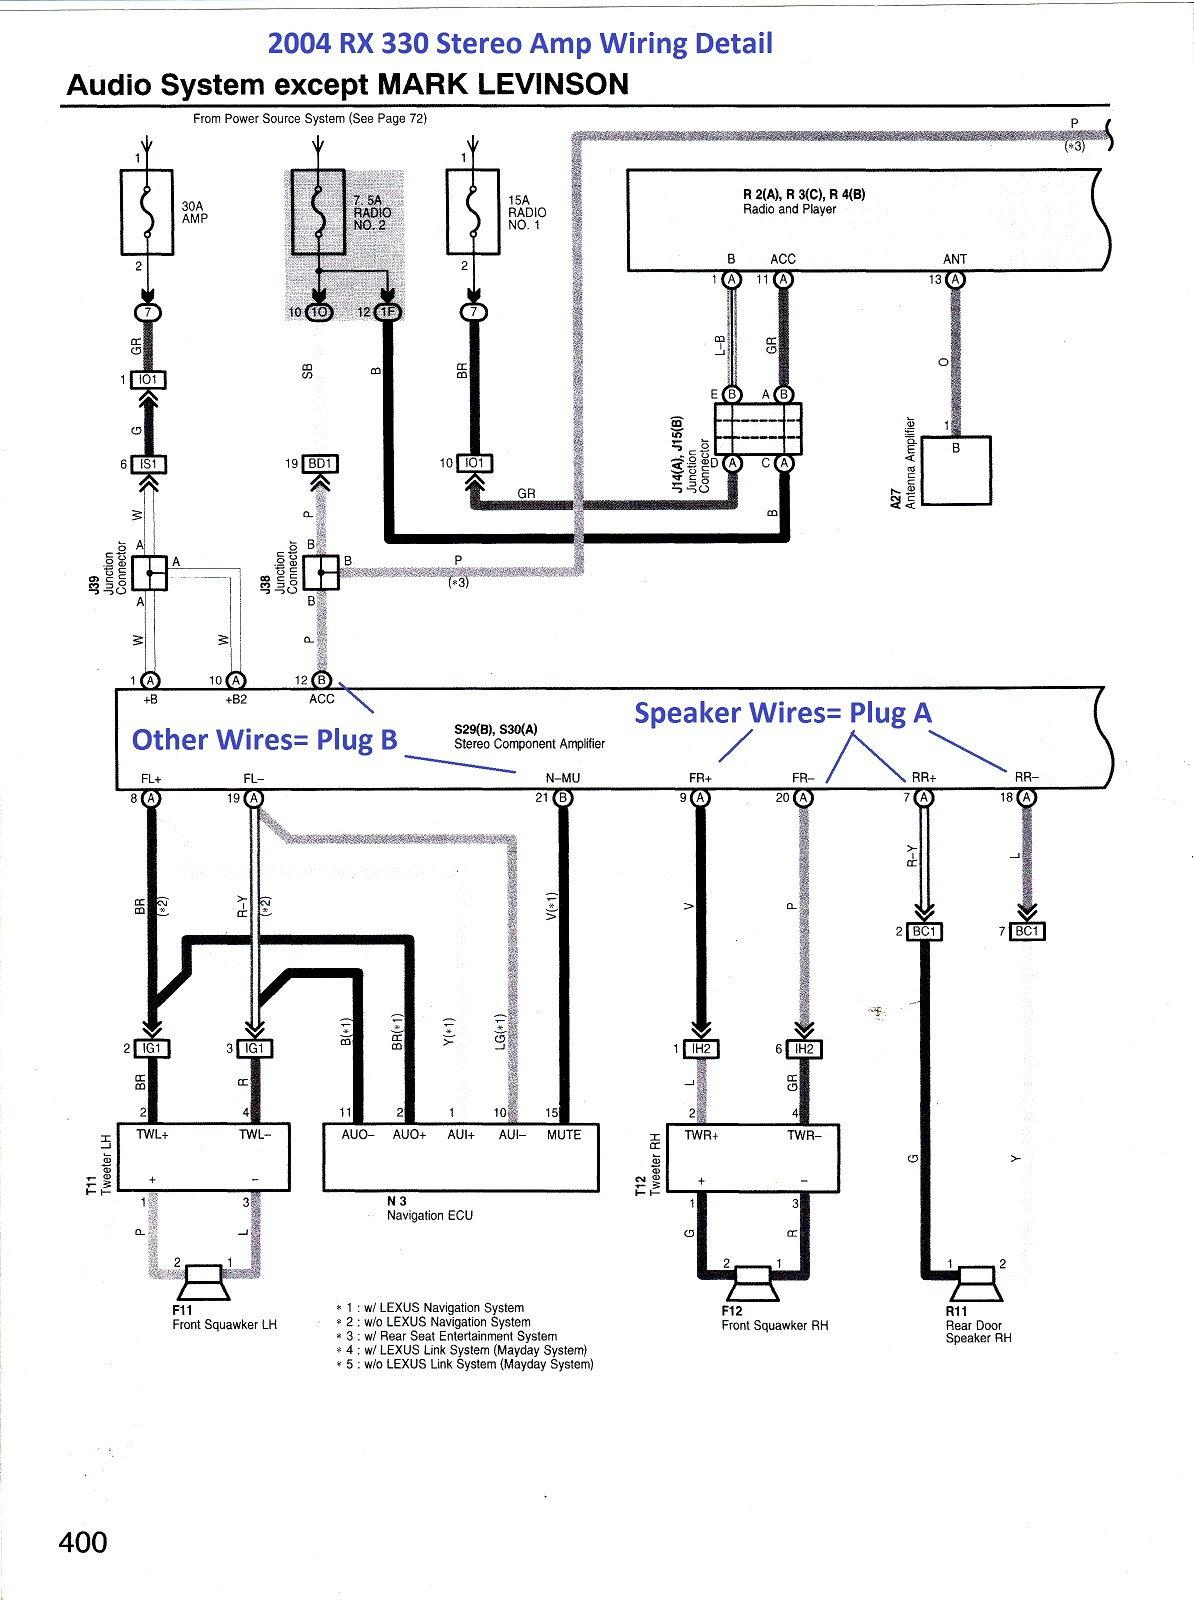 DIAGRAM] 2005 Lexus Rx330 Wiring Diagram FULL Version HD Quality Wiring  Diagram - SCARYDIAGRAMS.GENAZZANOBUONCONSIGLIO.ITscarydiagrams.genazzanobuonconsiglio.it